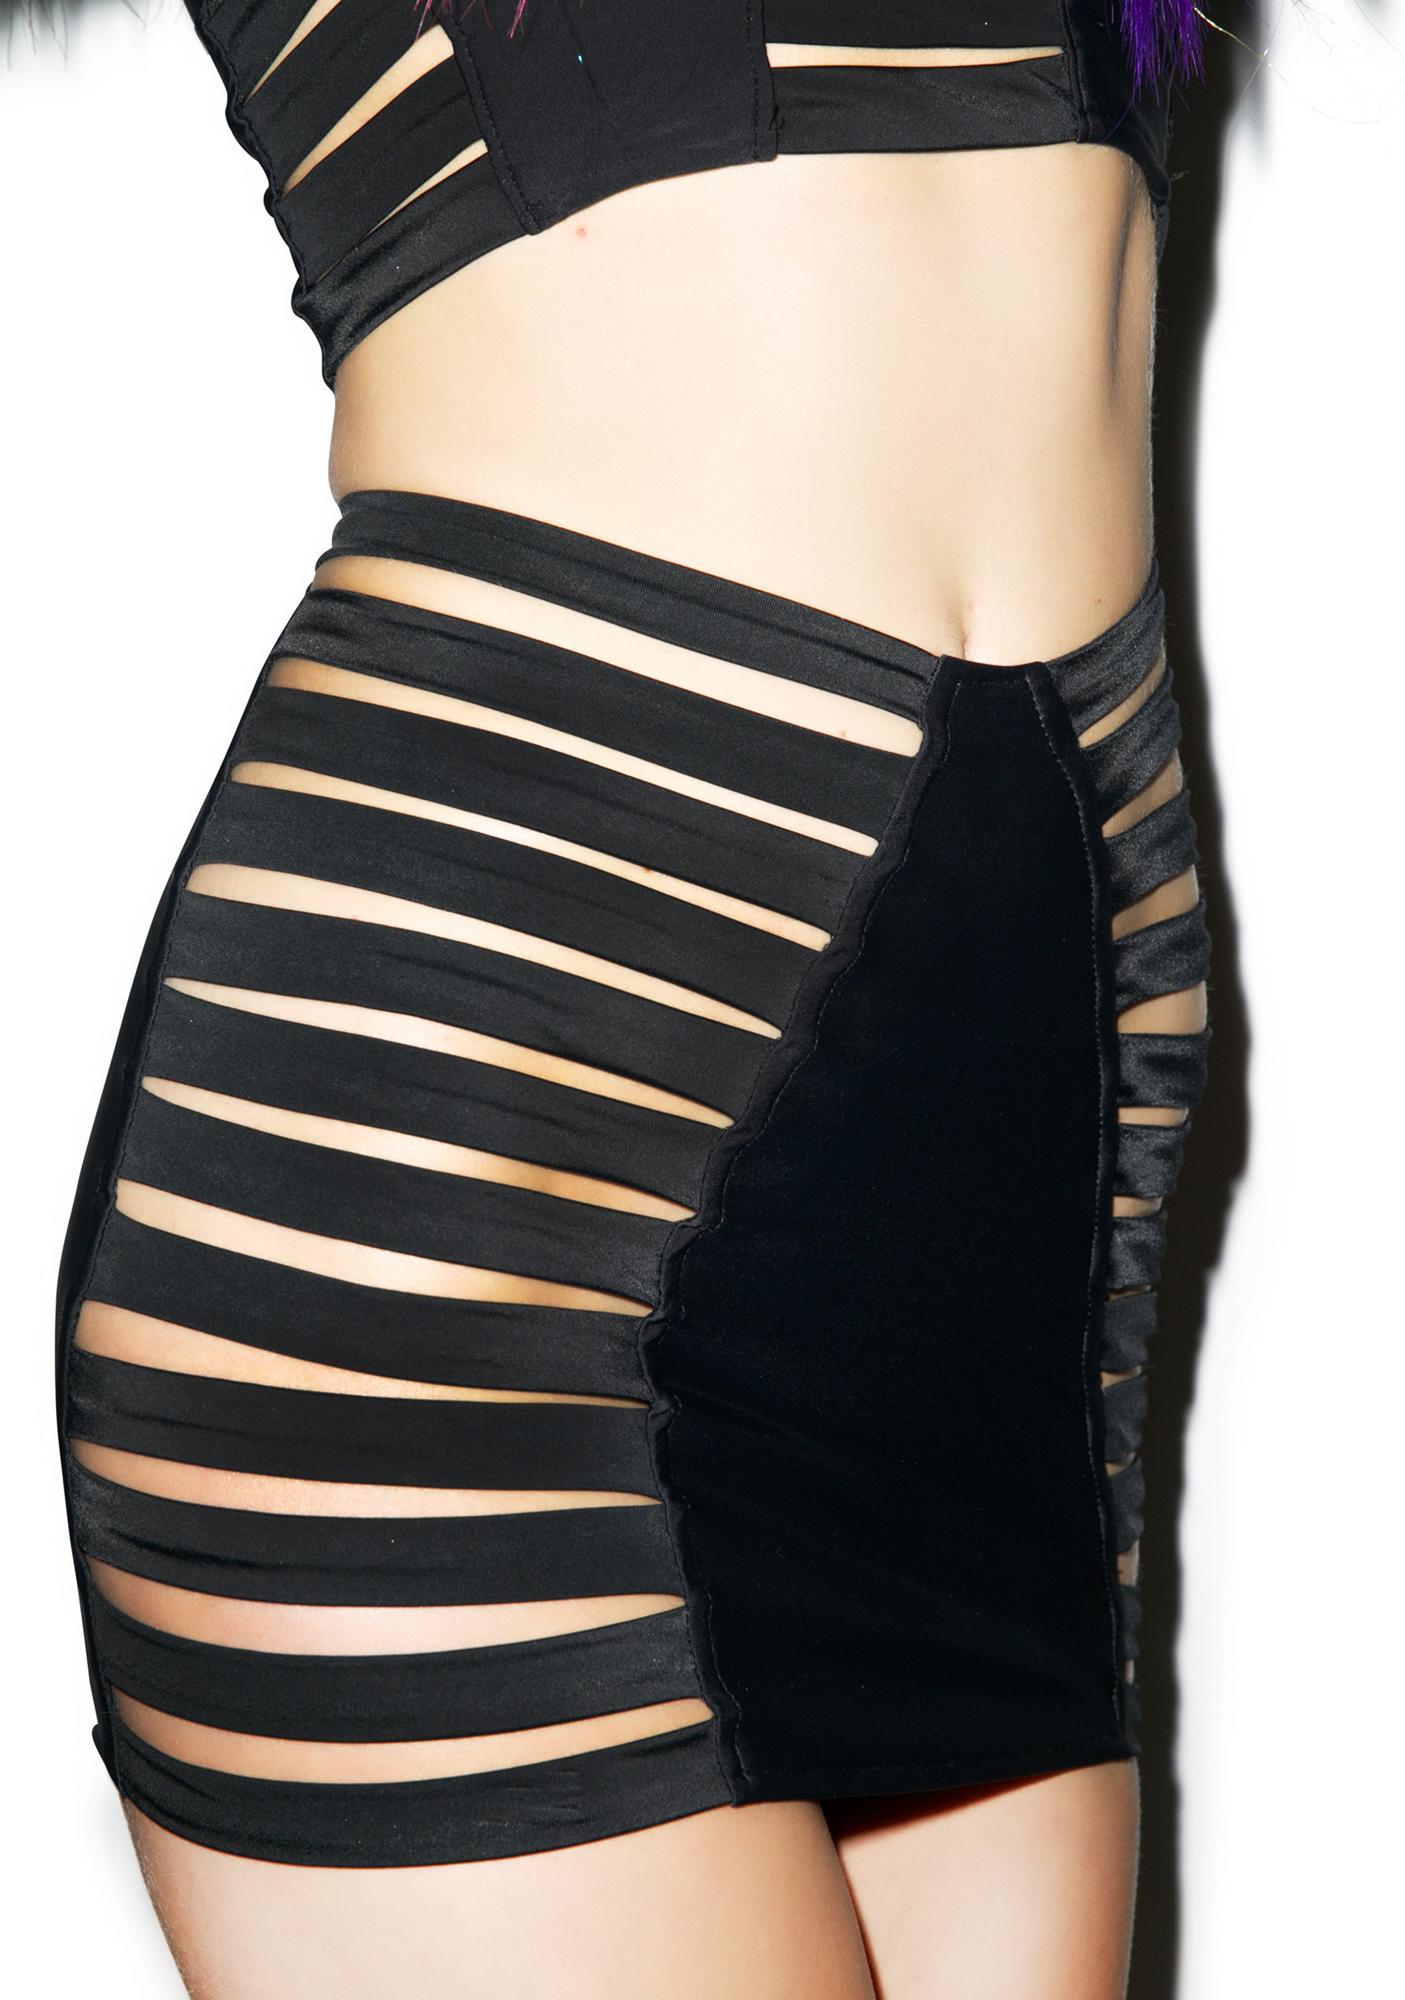 J Valentine Black Widow Strappy Skirt